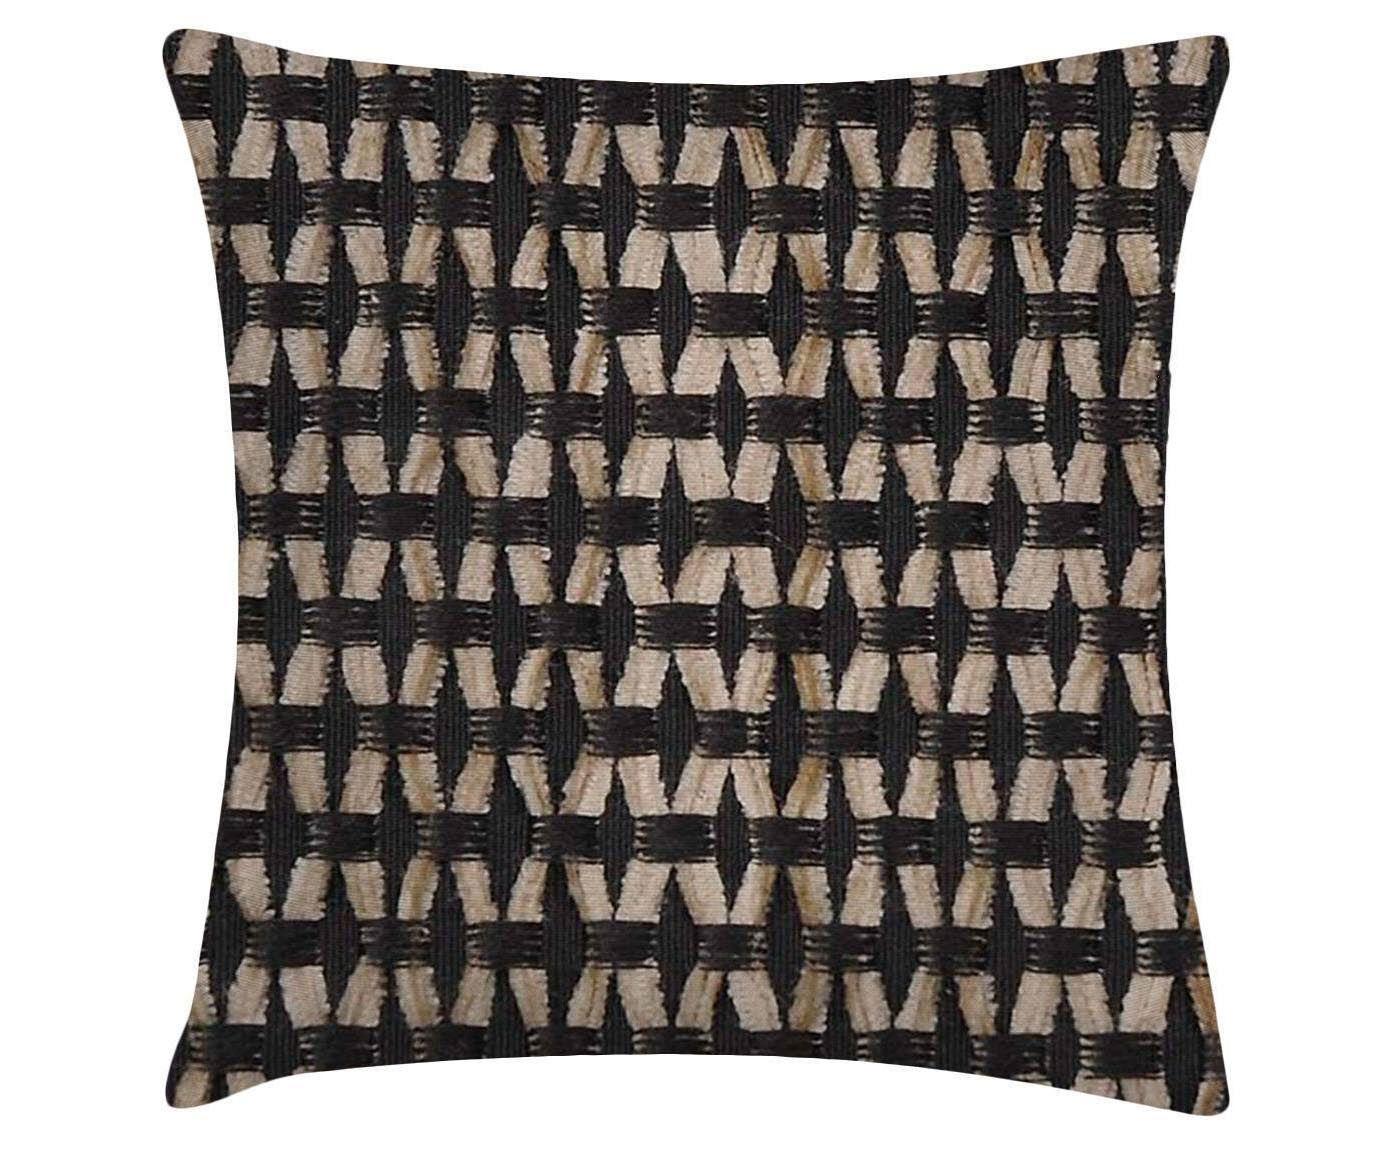 Capa para almofada couture saara - 45x45cm | Westwing.com.br